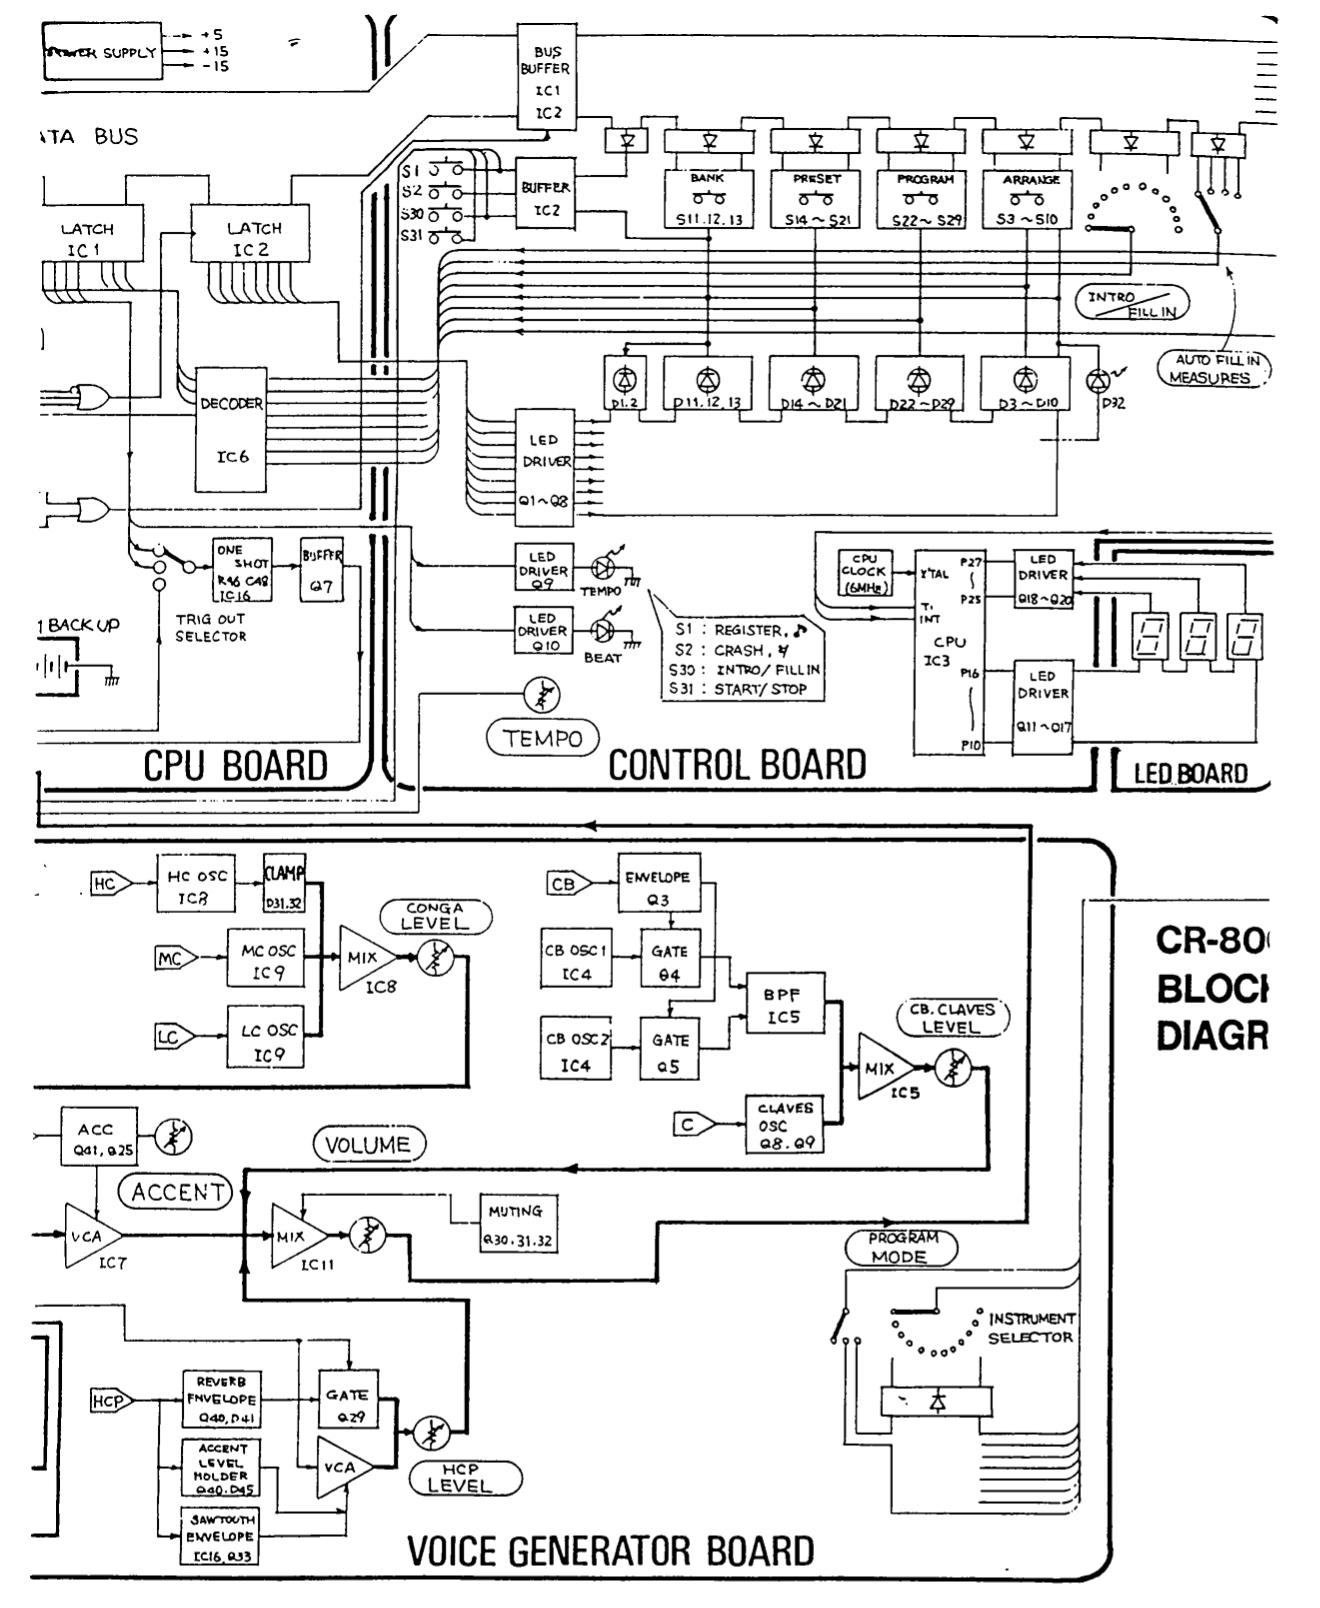 Roland Spd 6 Manual